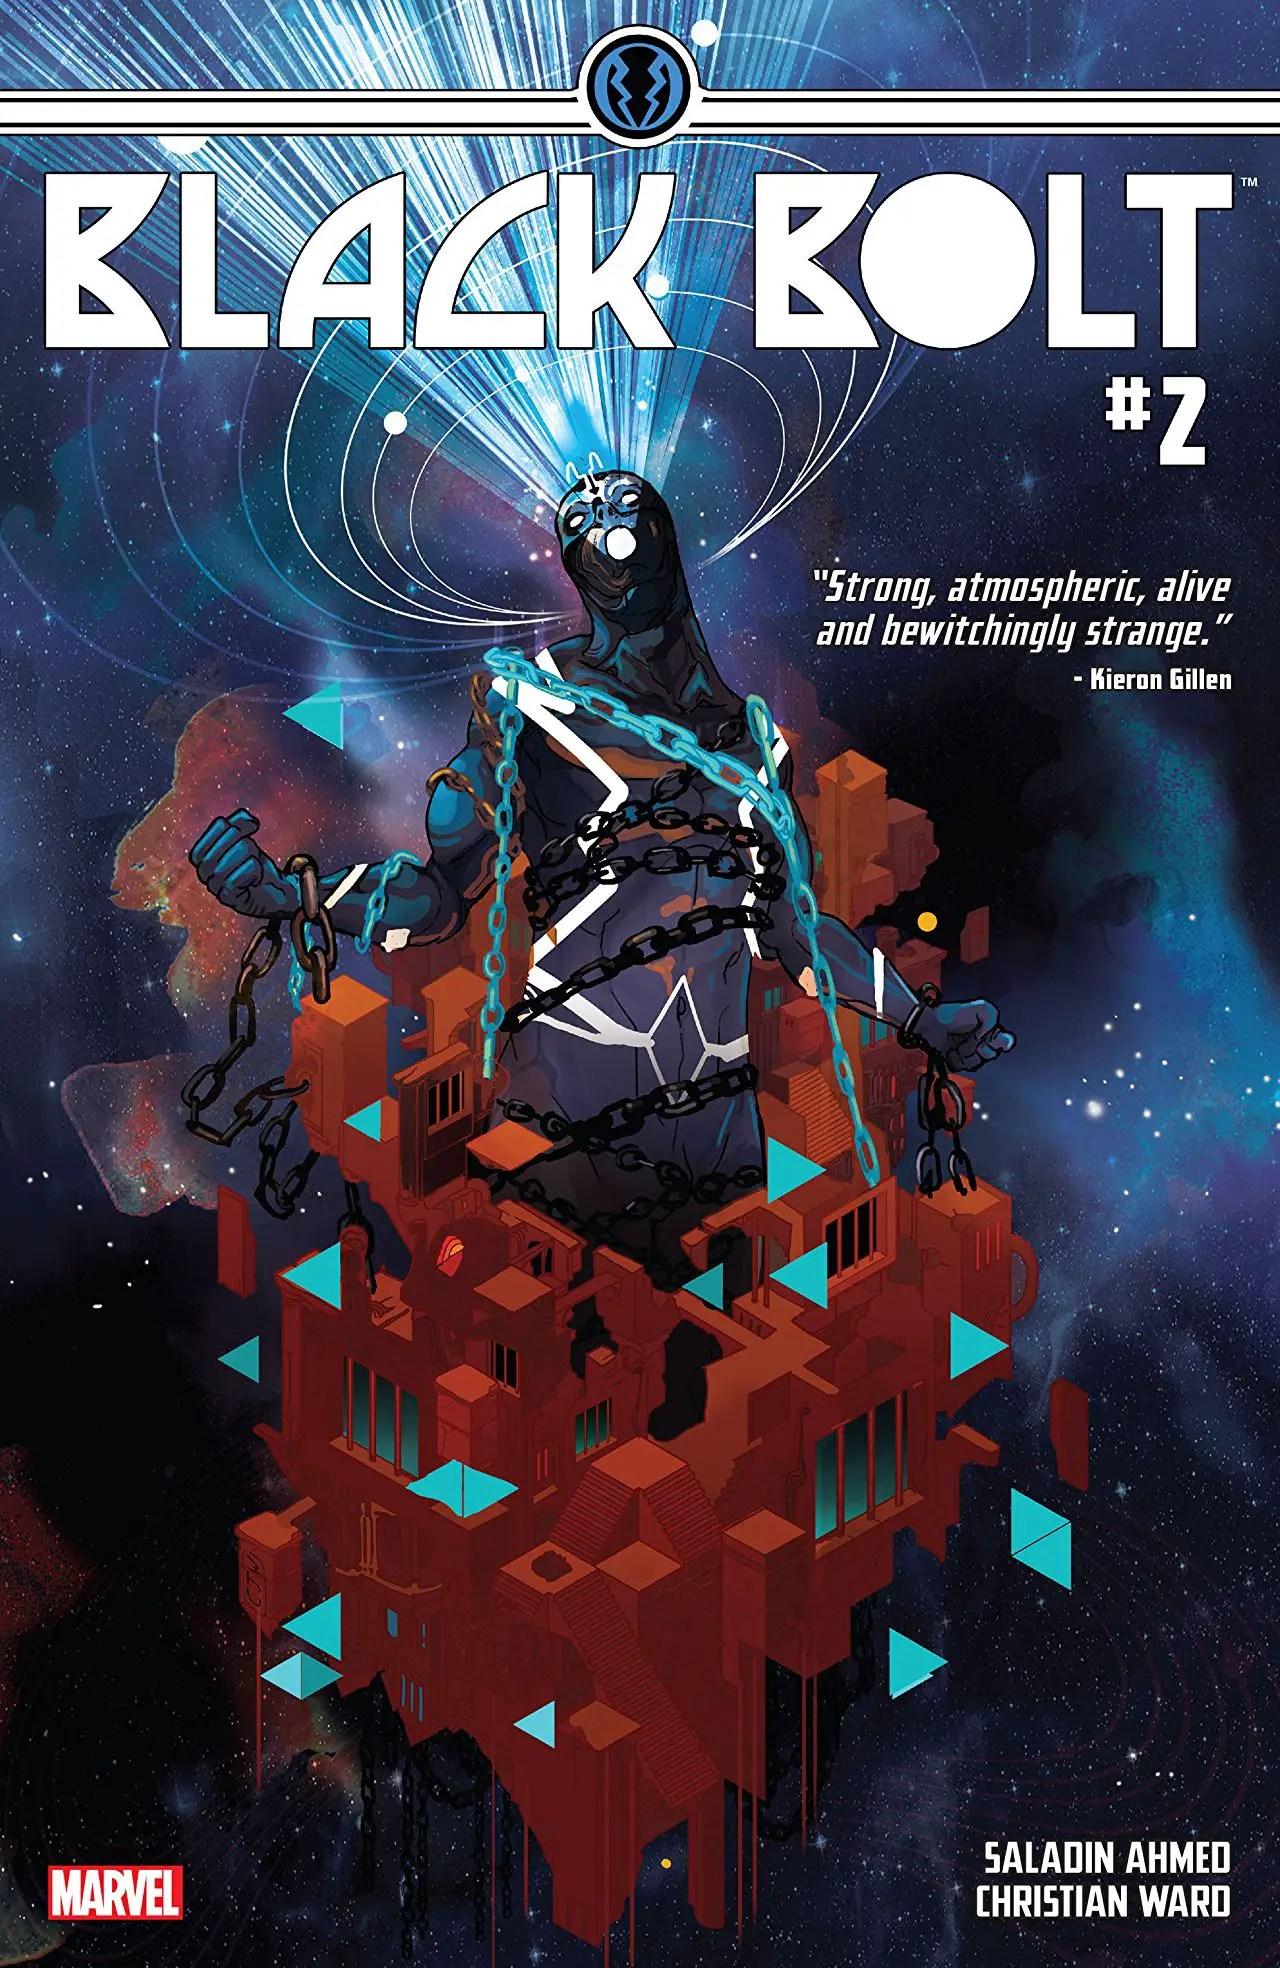 Black Bolt #2 Review